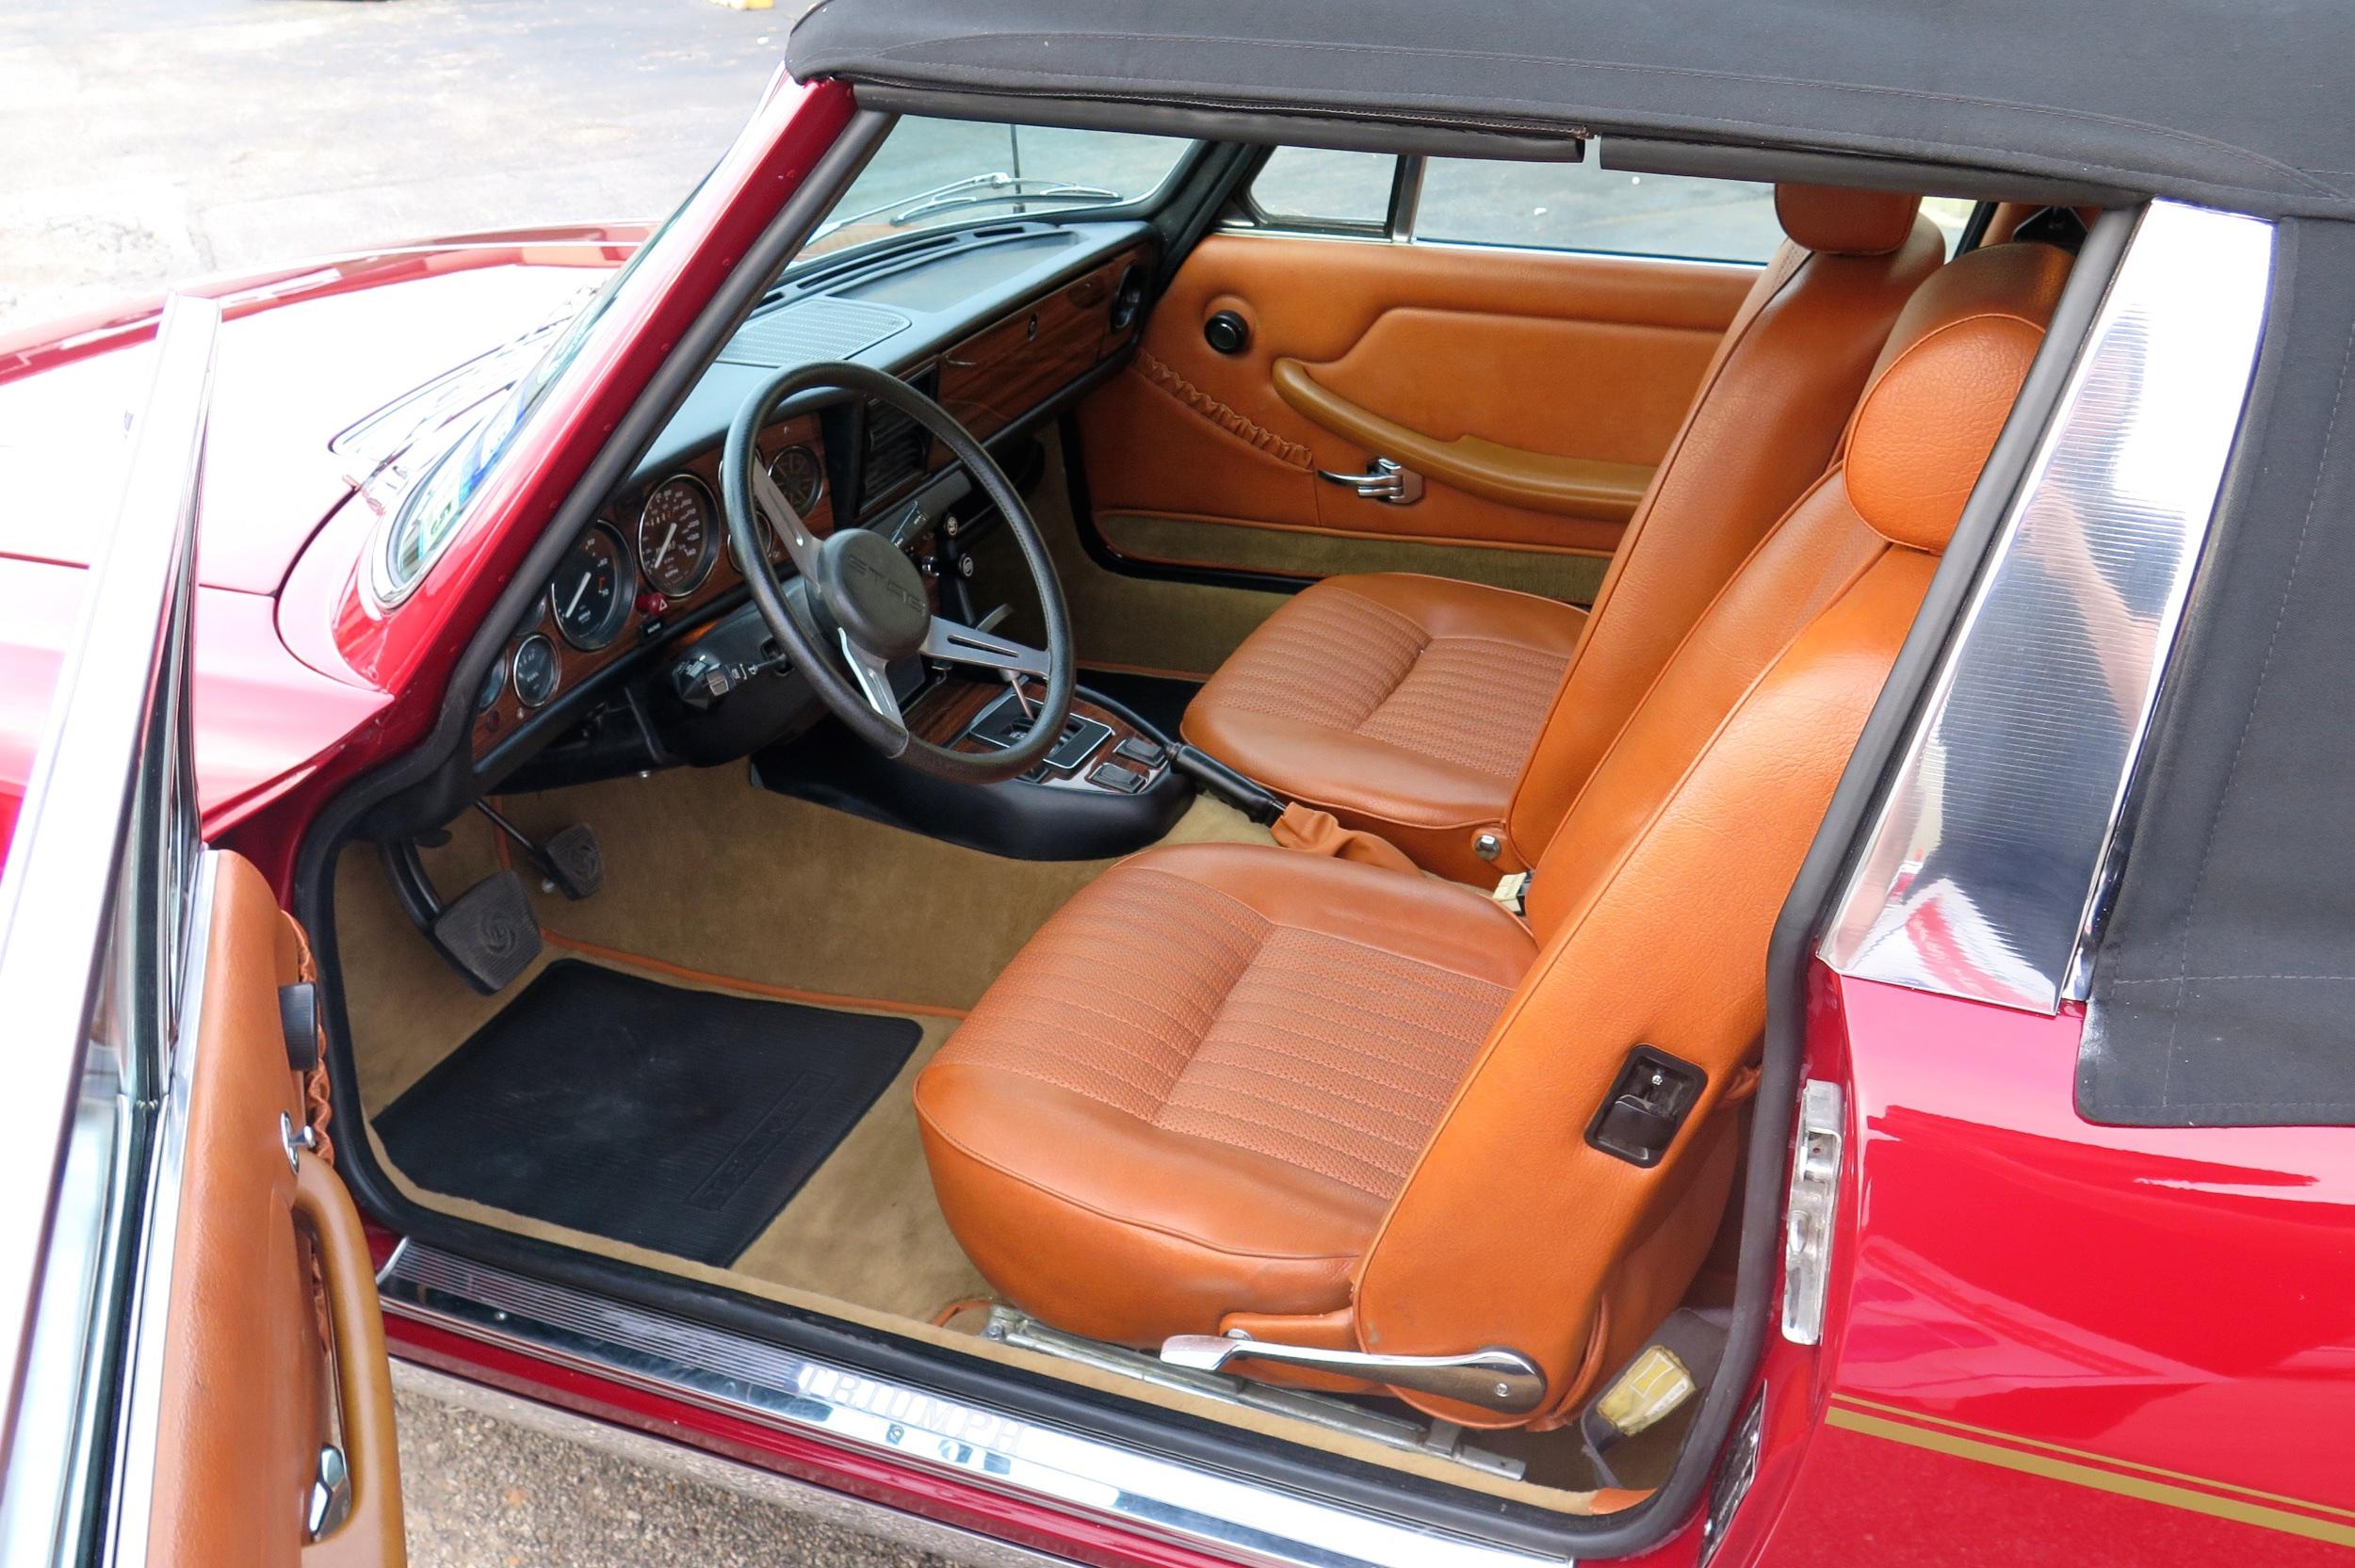 007_1973_Triumph_Stag-IMG_4982.jpg